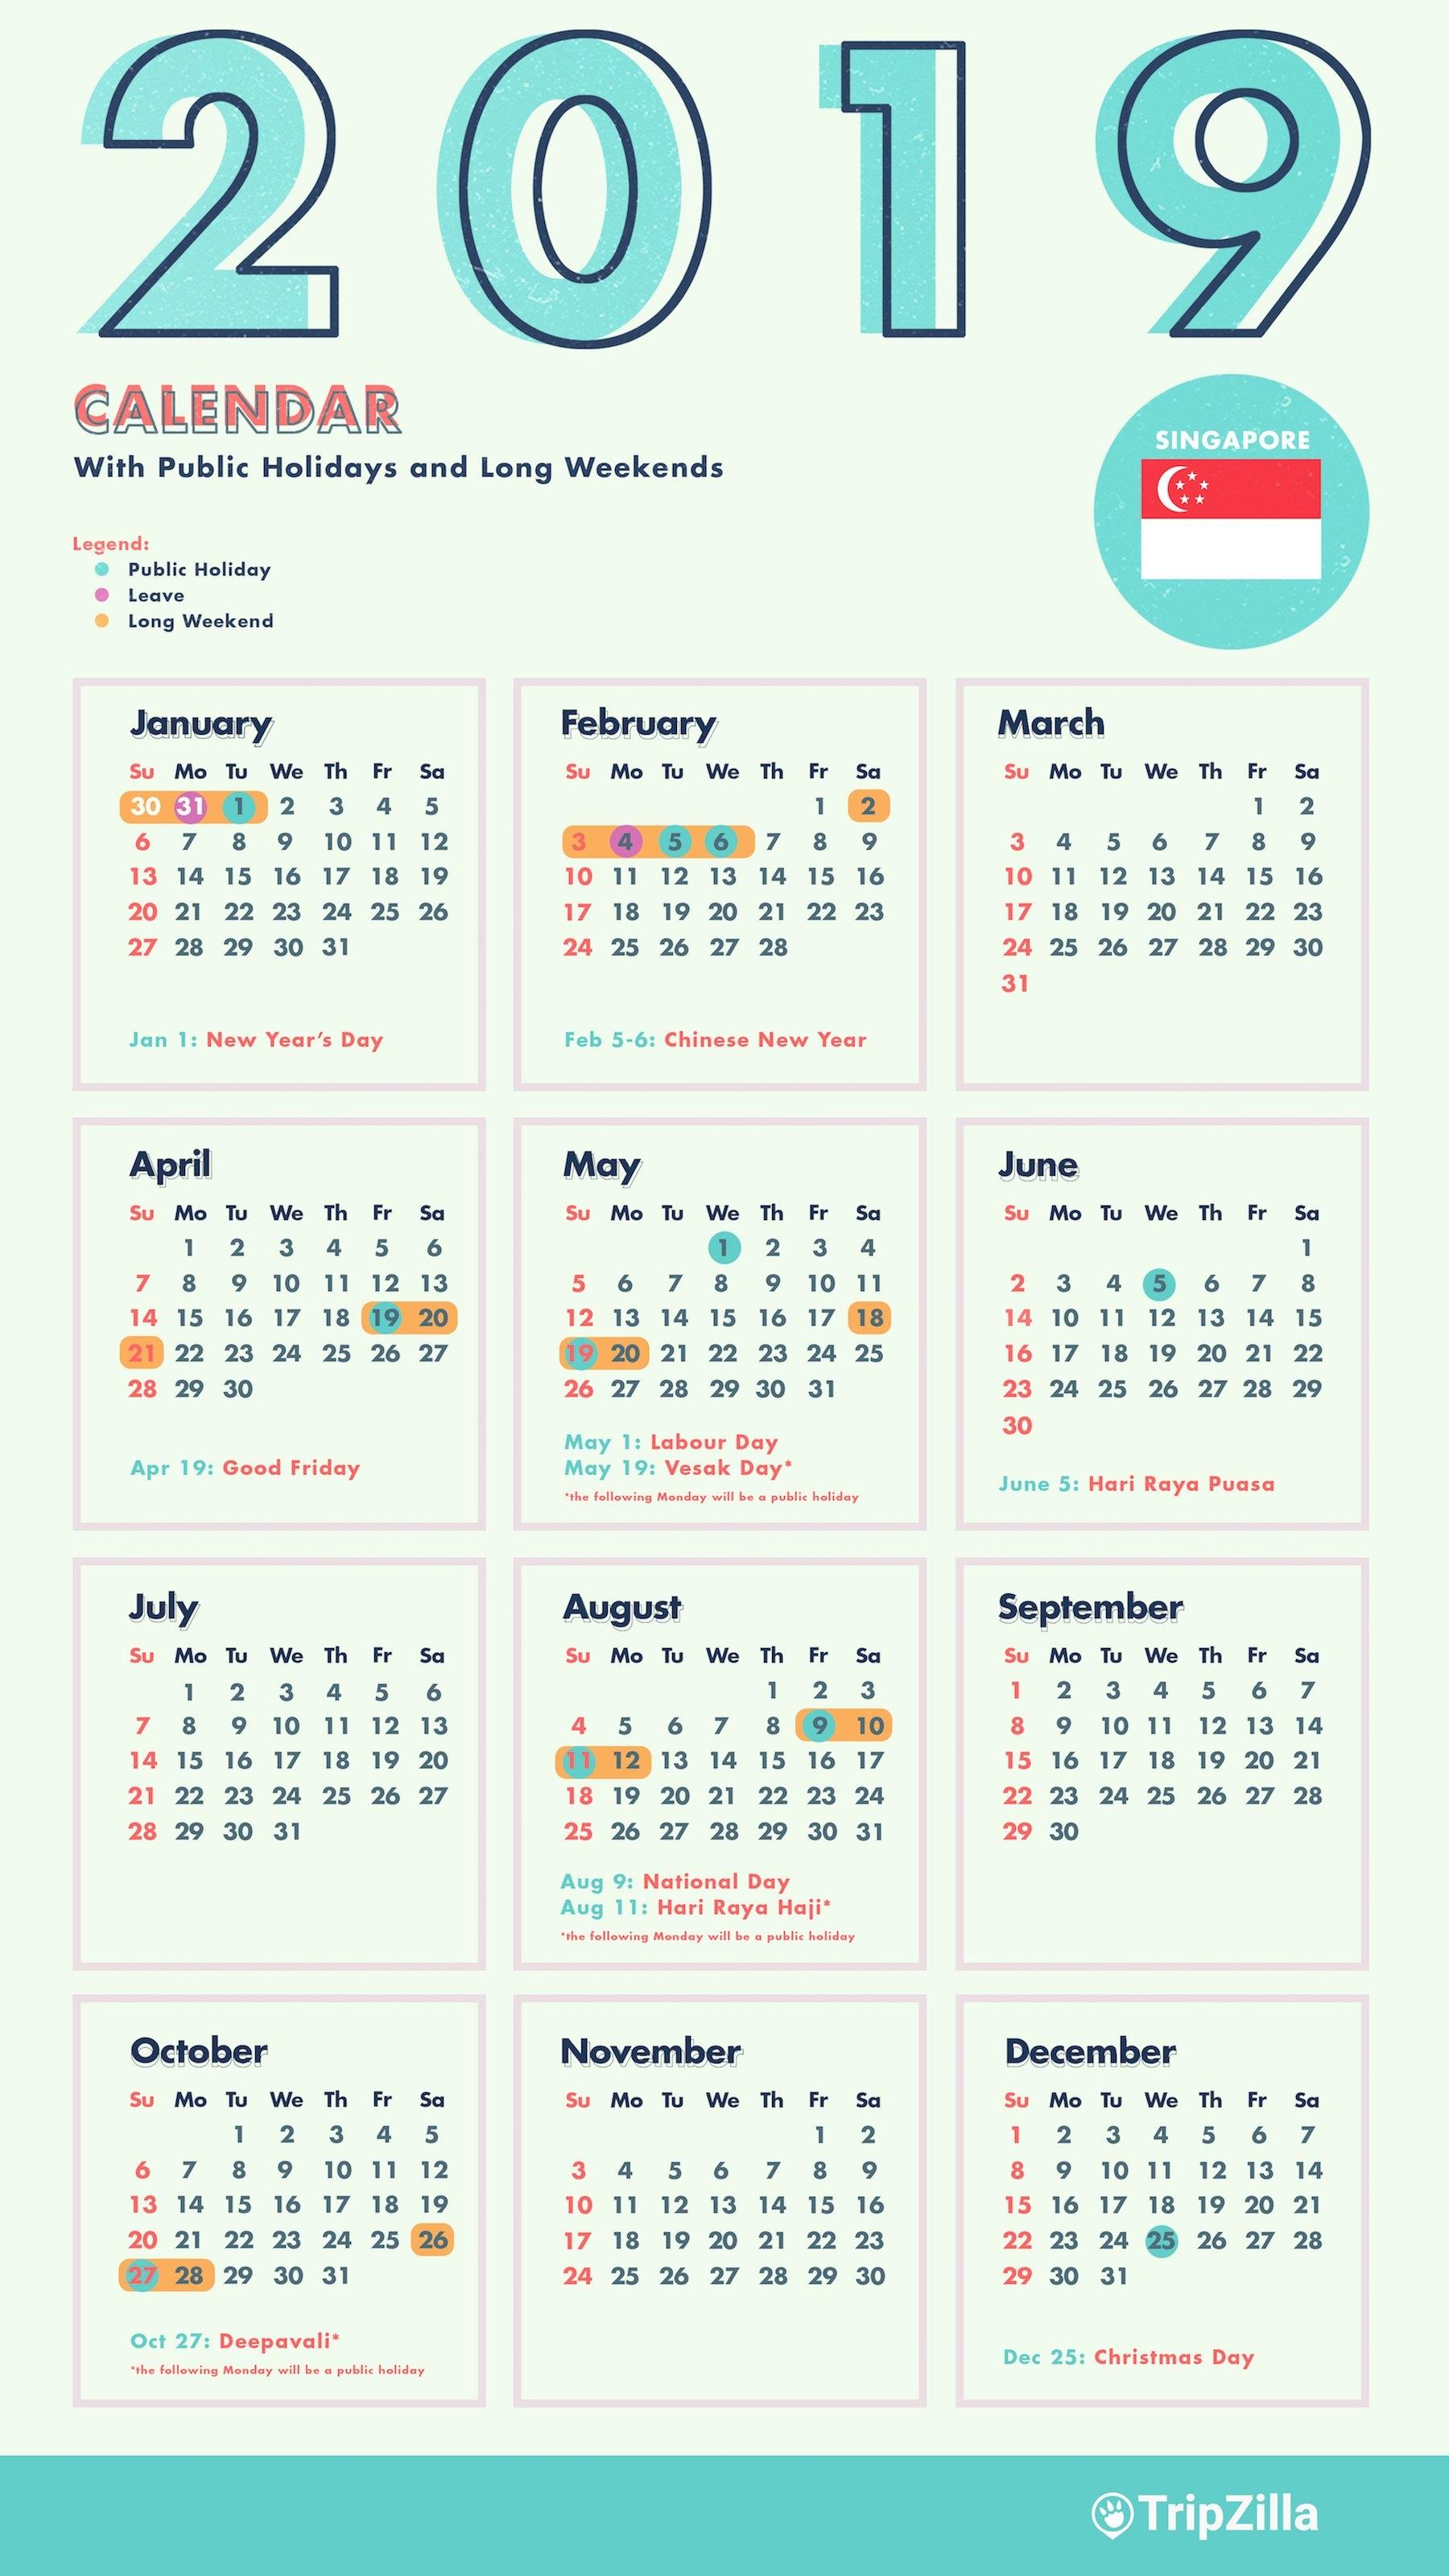 6 Long Weekends In Singapore In 2019 (Bonus Calendar & Cheatsheet) Calendar 2019 Raya